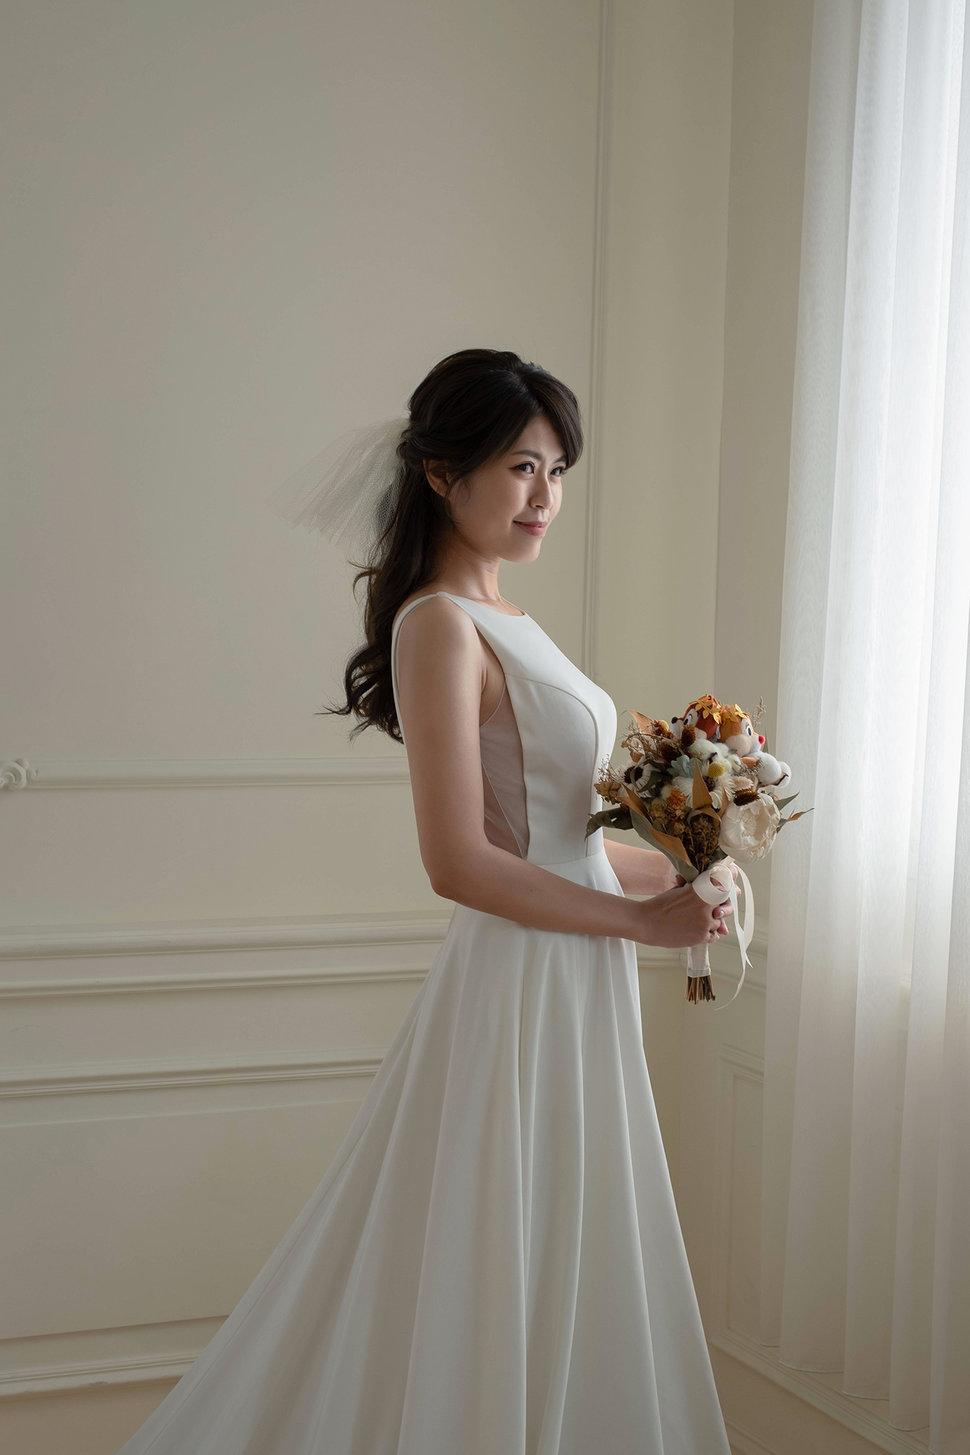 DSCF33692拷貝 - Stylist Leann 麗如《結婚吧》